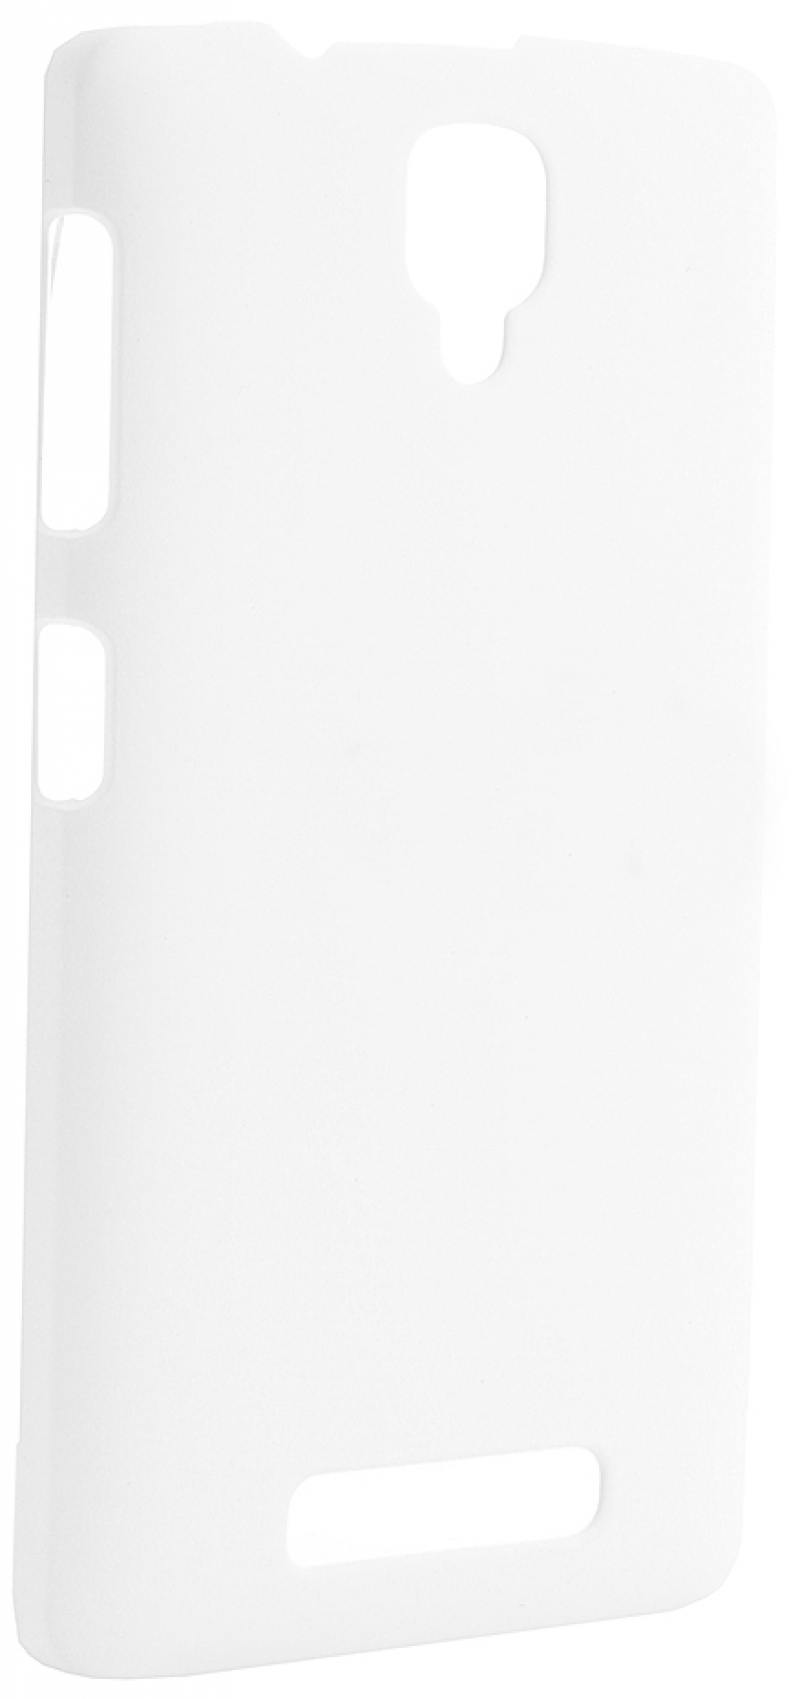 Чехол-накладка Pulsar CLIPCASE PC Soft-Touch для Lenovo A1000 (белая) чехол для lenovo a1000 силиконовый tpu белый 0 3 мм коллекция green cases